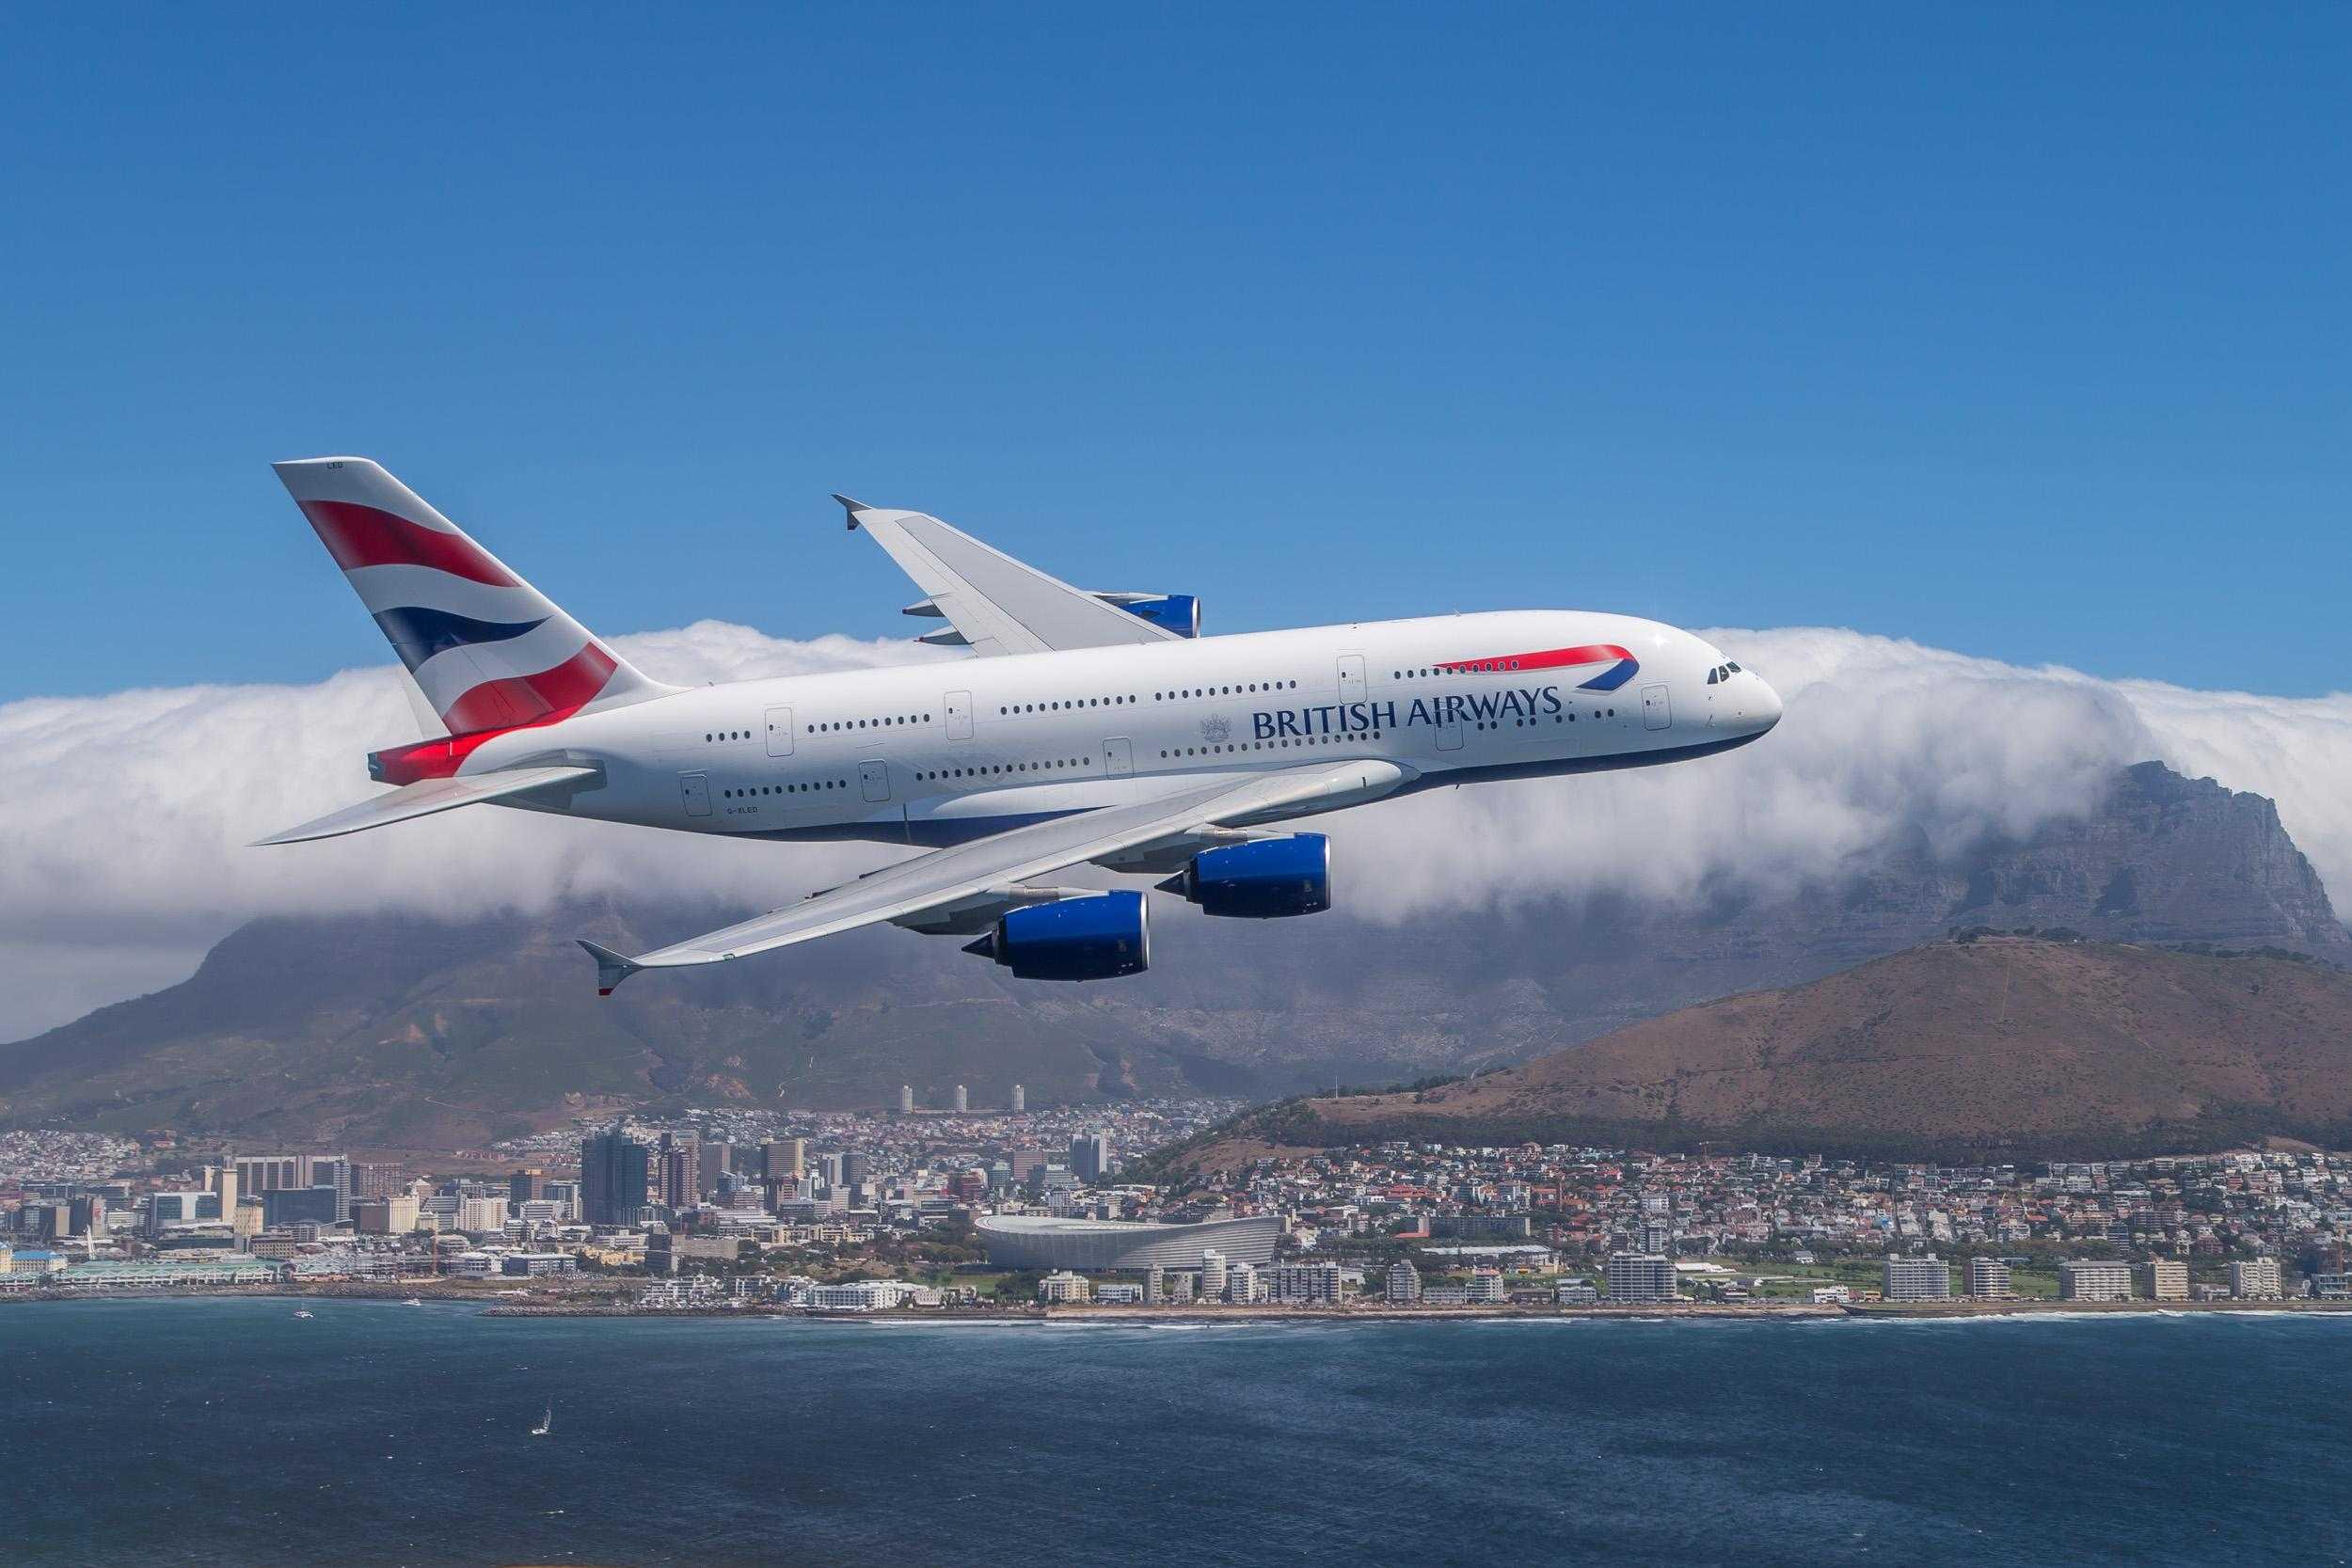 Noul A380 deasupra Cape Town